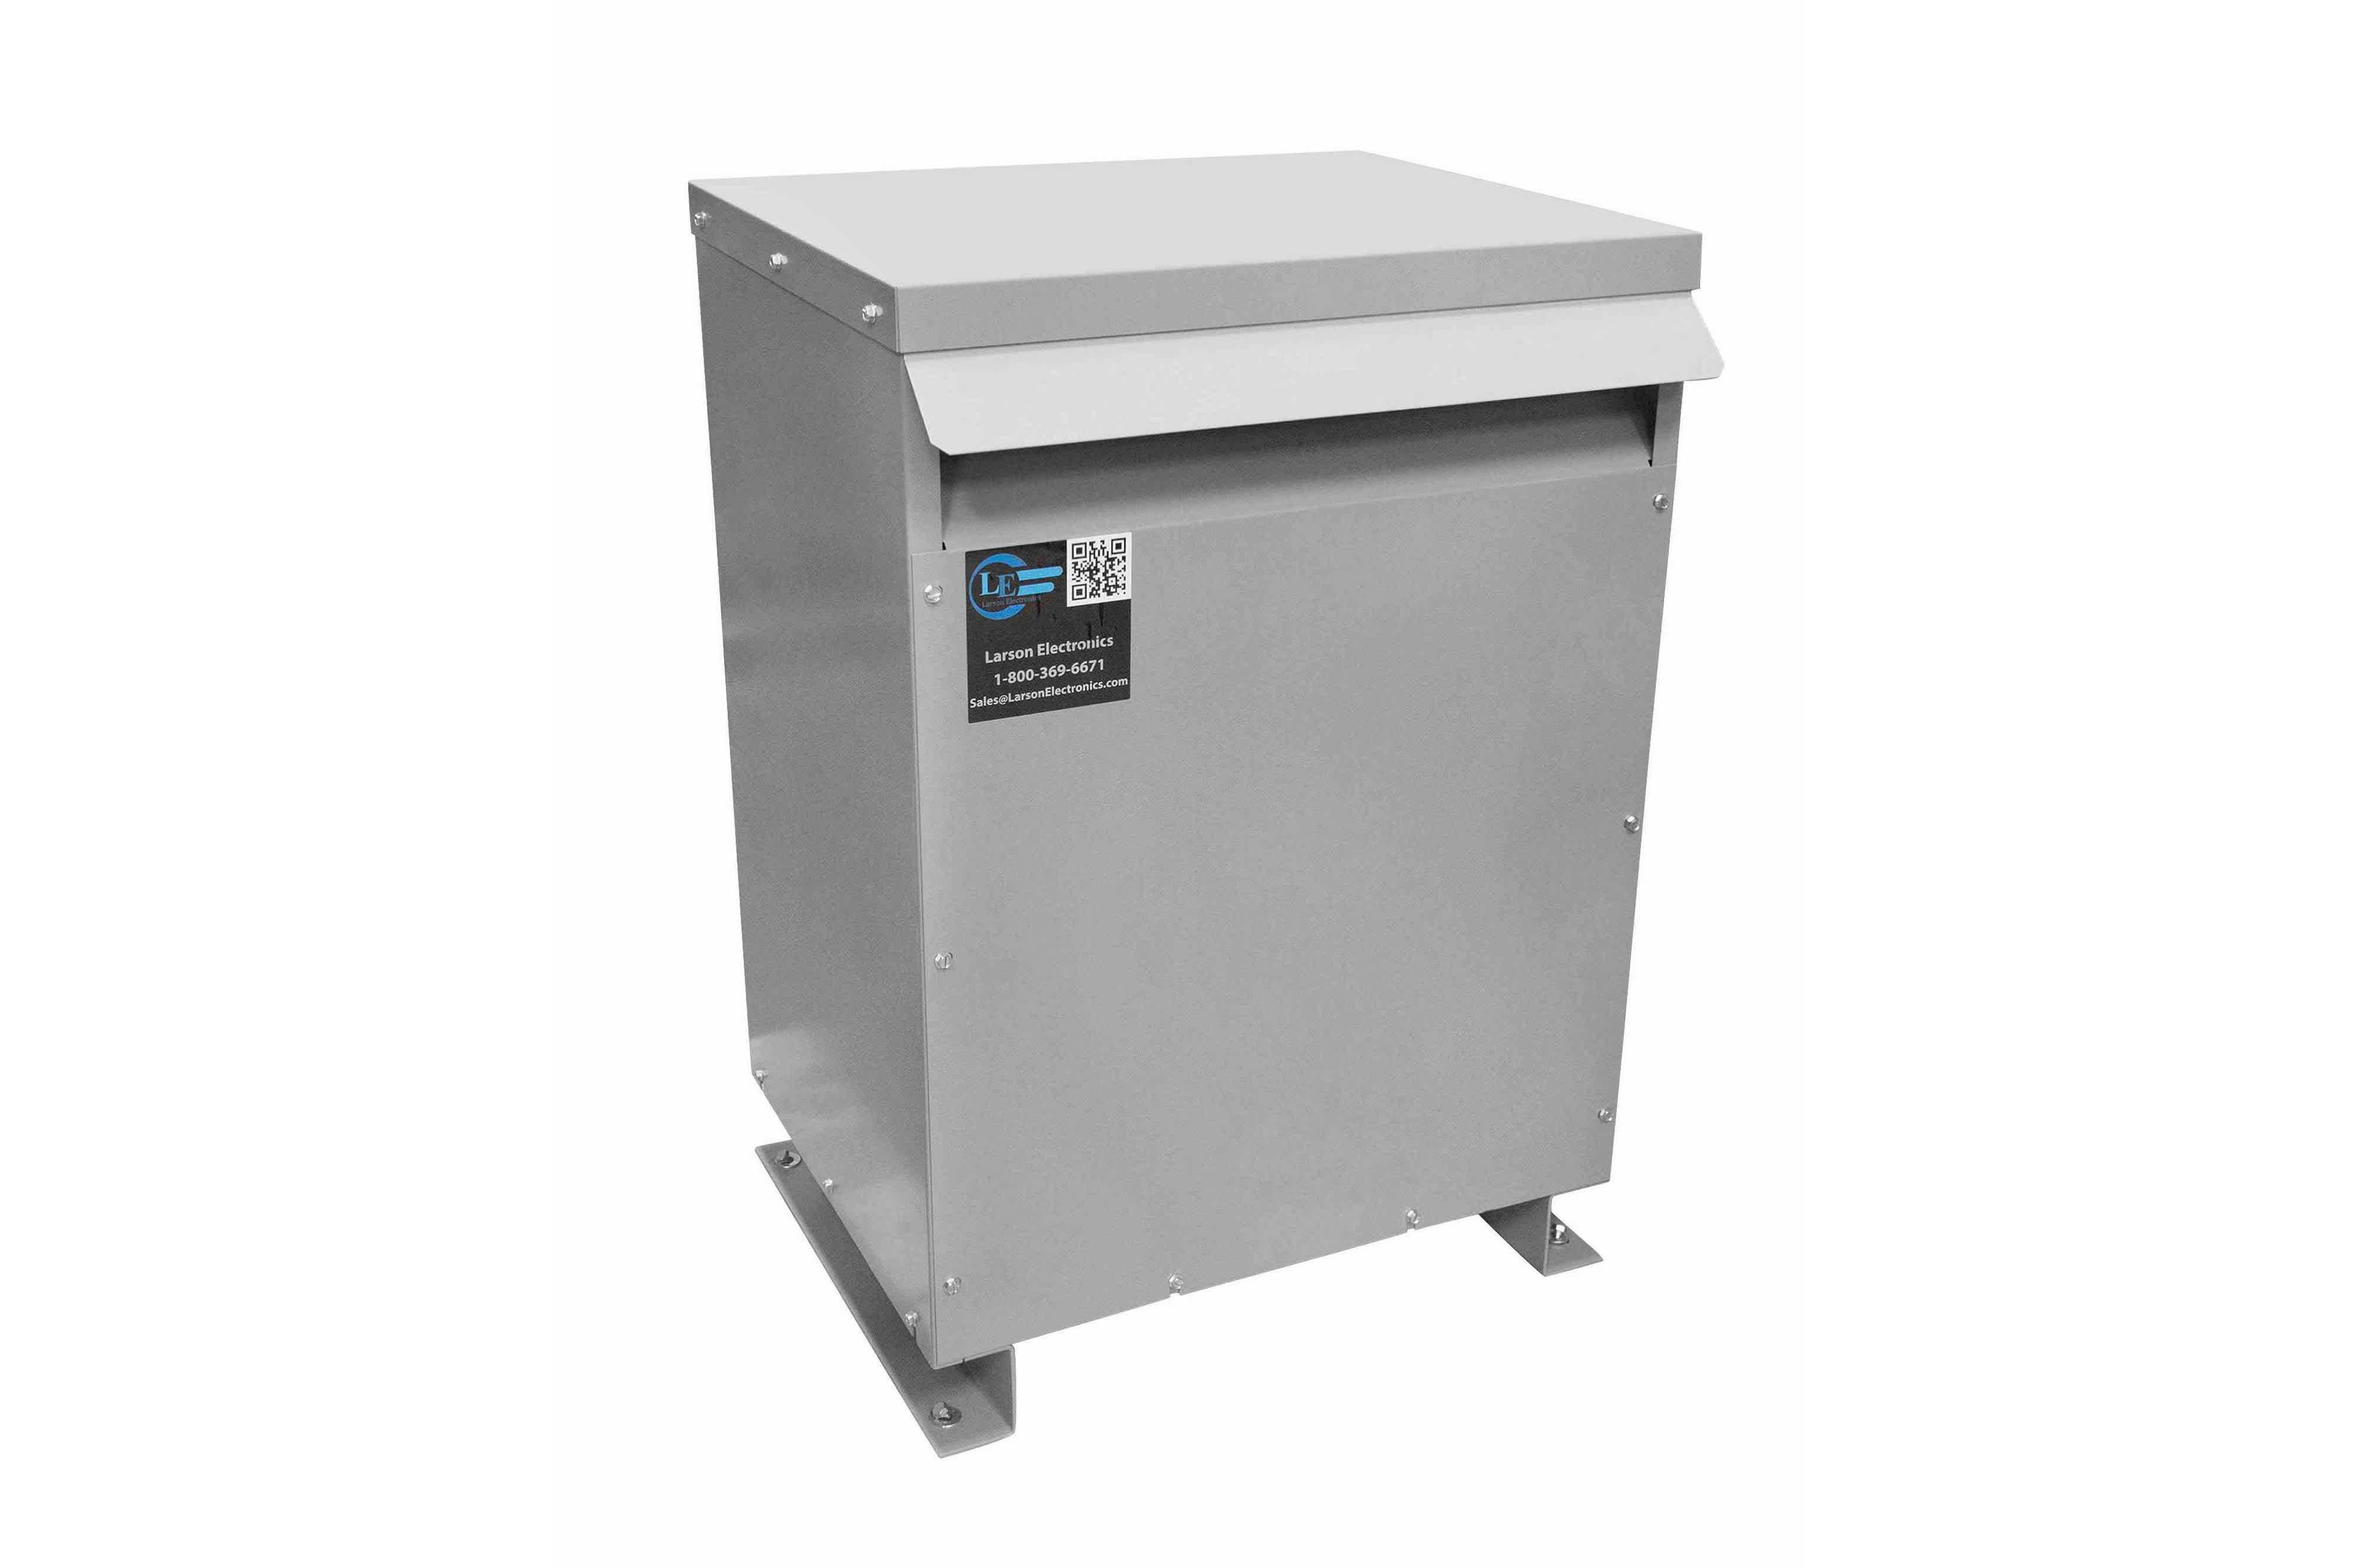 225 kVA 3PH Isolation Transformer, 240V Wye Primary, 480V Delta Secondary, N3R, Ventilated, 60 Hz